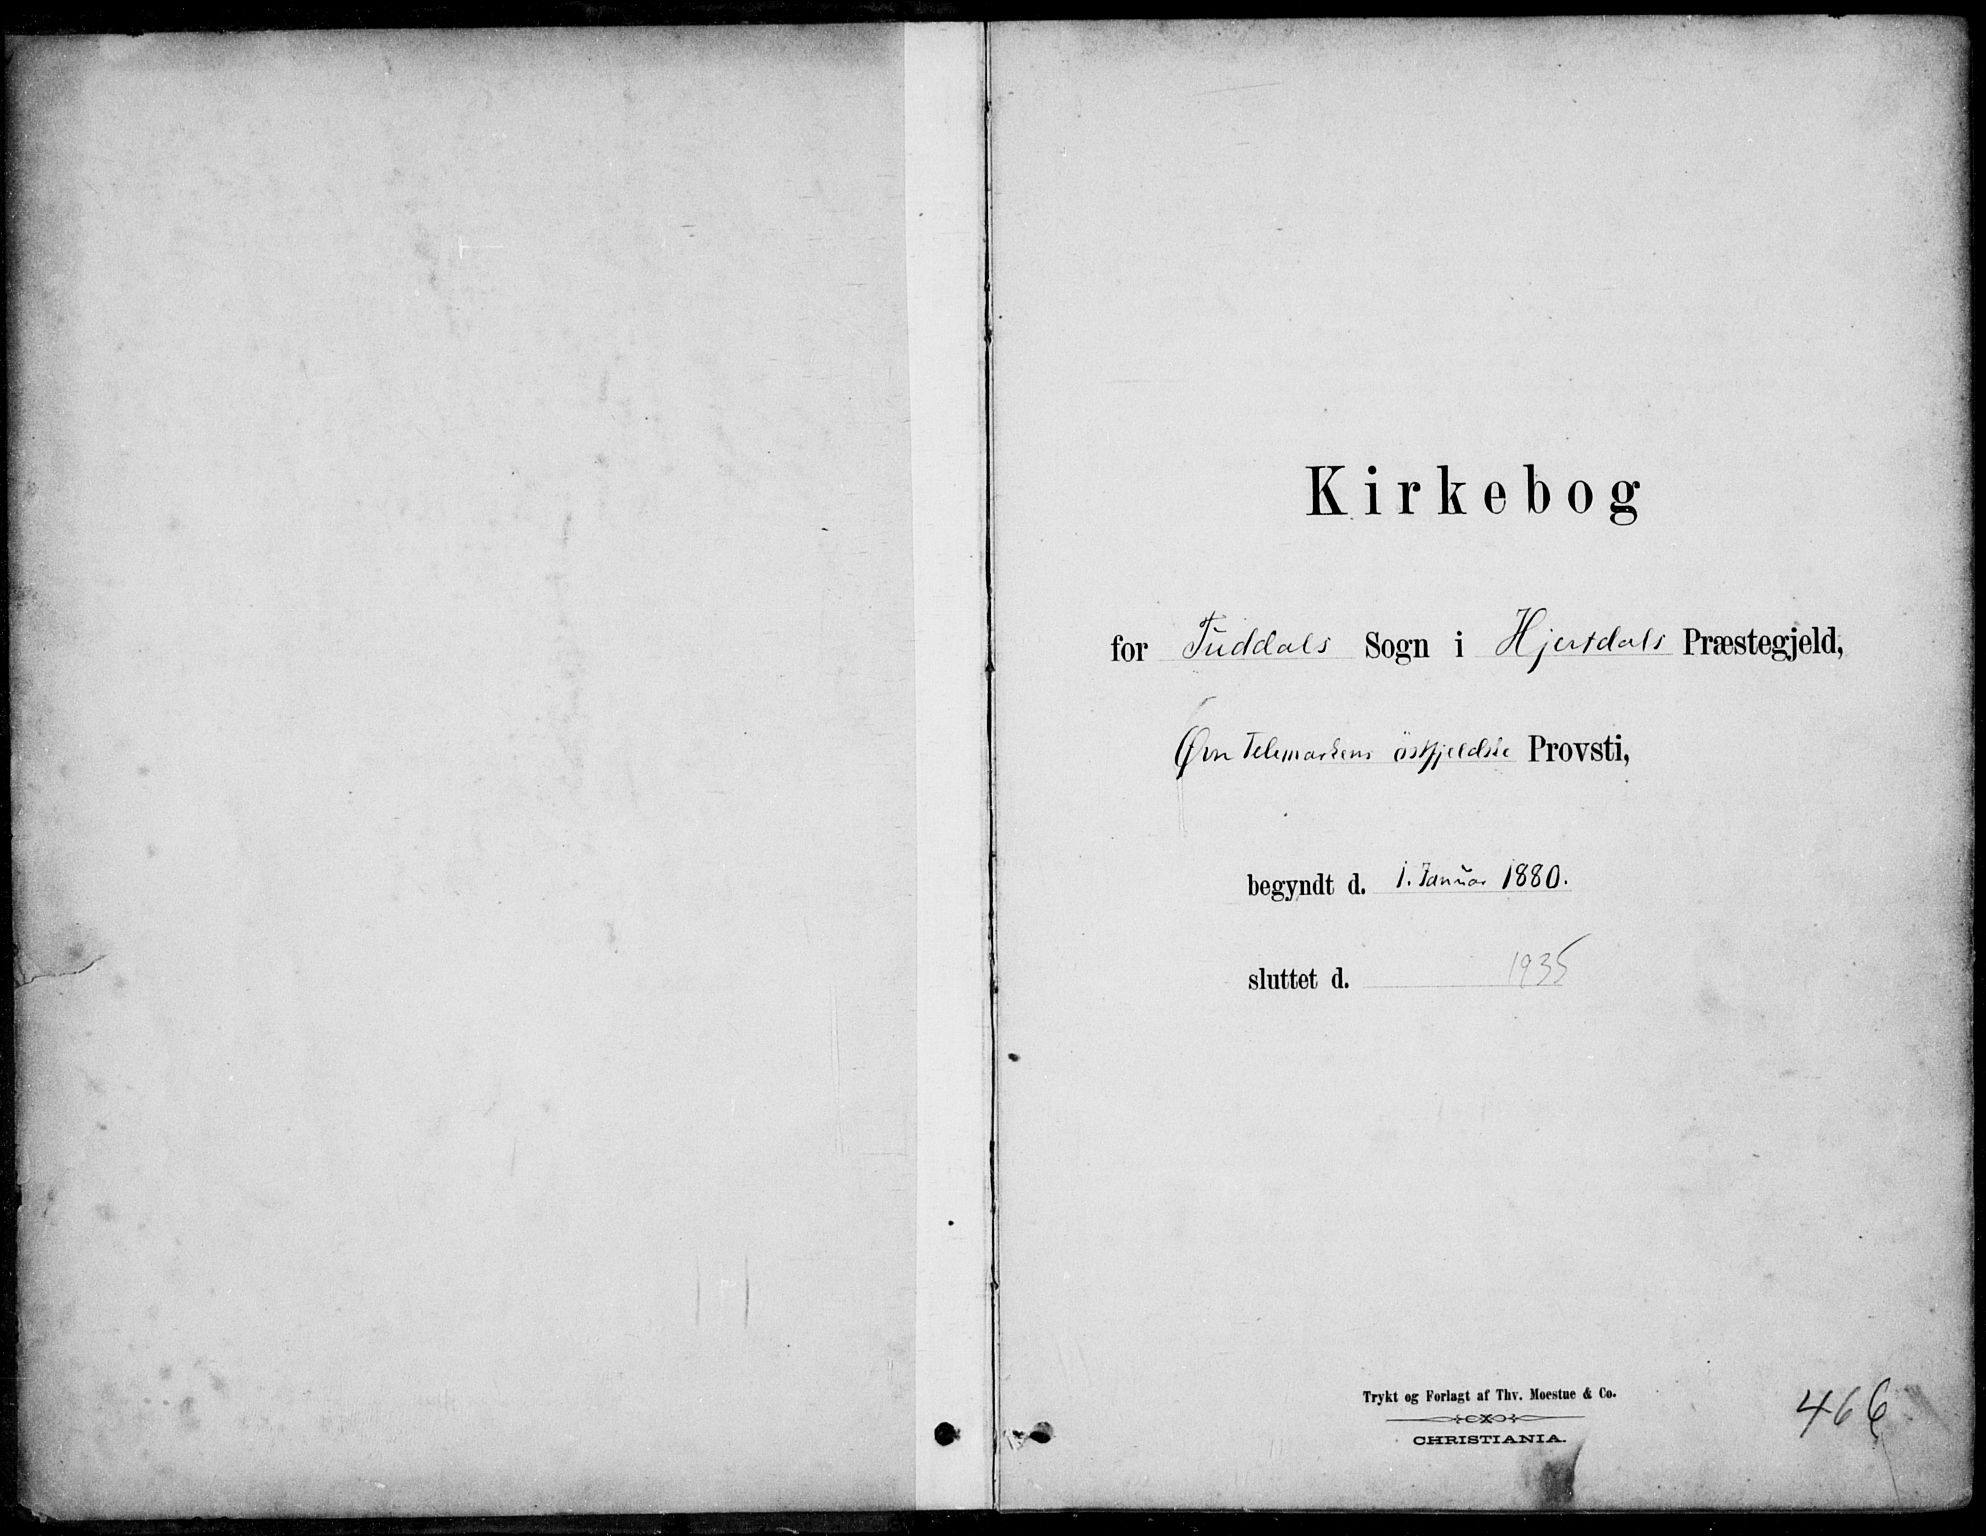 SAKO, Hjartdal kirkebøker, F/Fc/L0002: Ministerialbok nr. III 2, 1880-1936